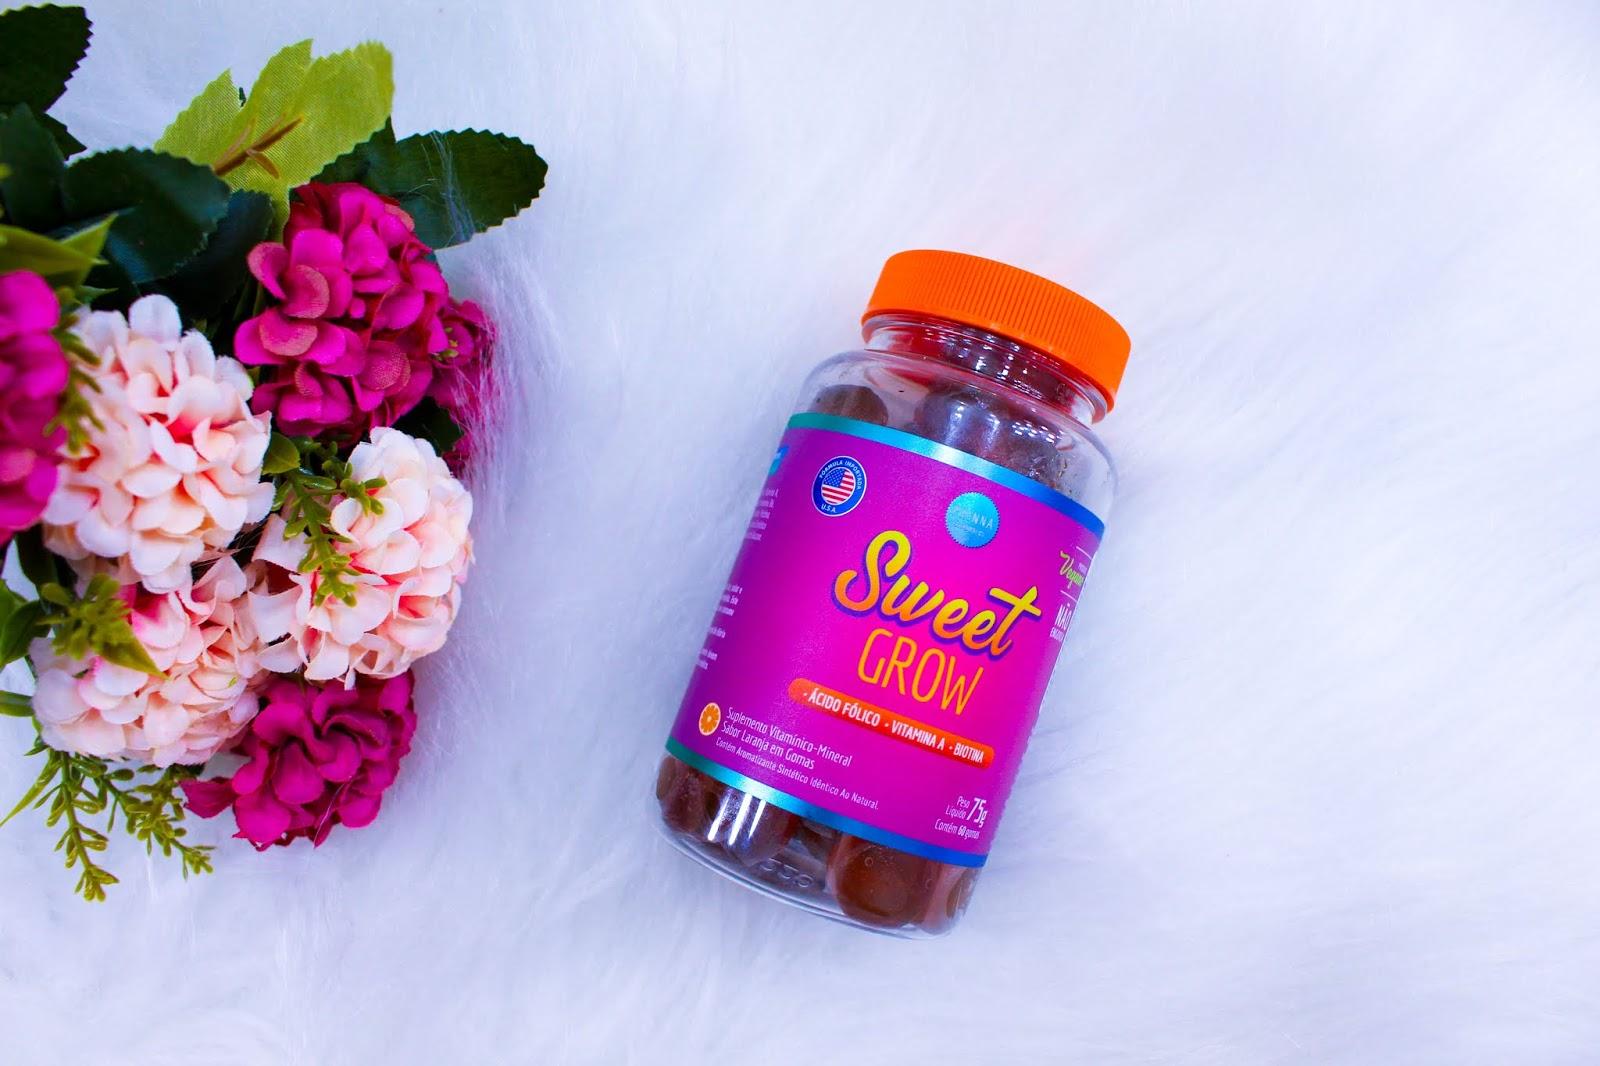 Suplemento Vitamínico-Mineral Sweet Grow da Phinna Cosméticos